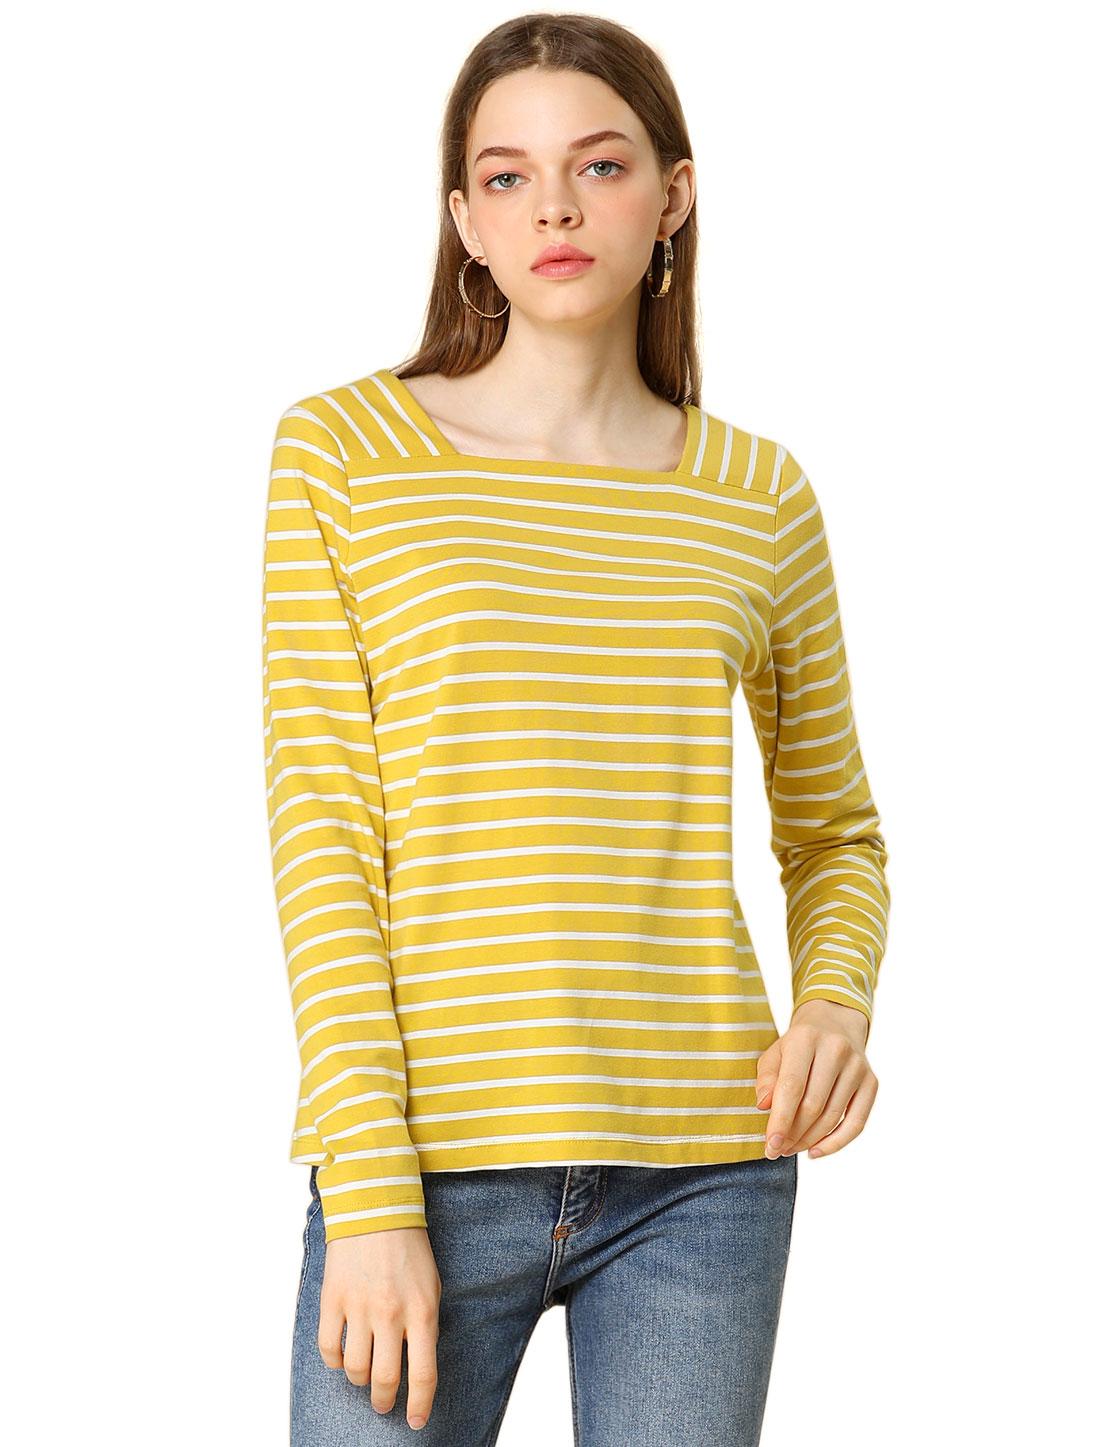 Allegra K Women's Long Sleeve Square Neck Striped T-Shirt Yellow XS